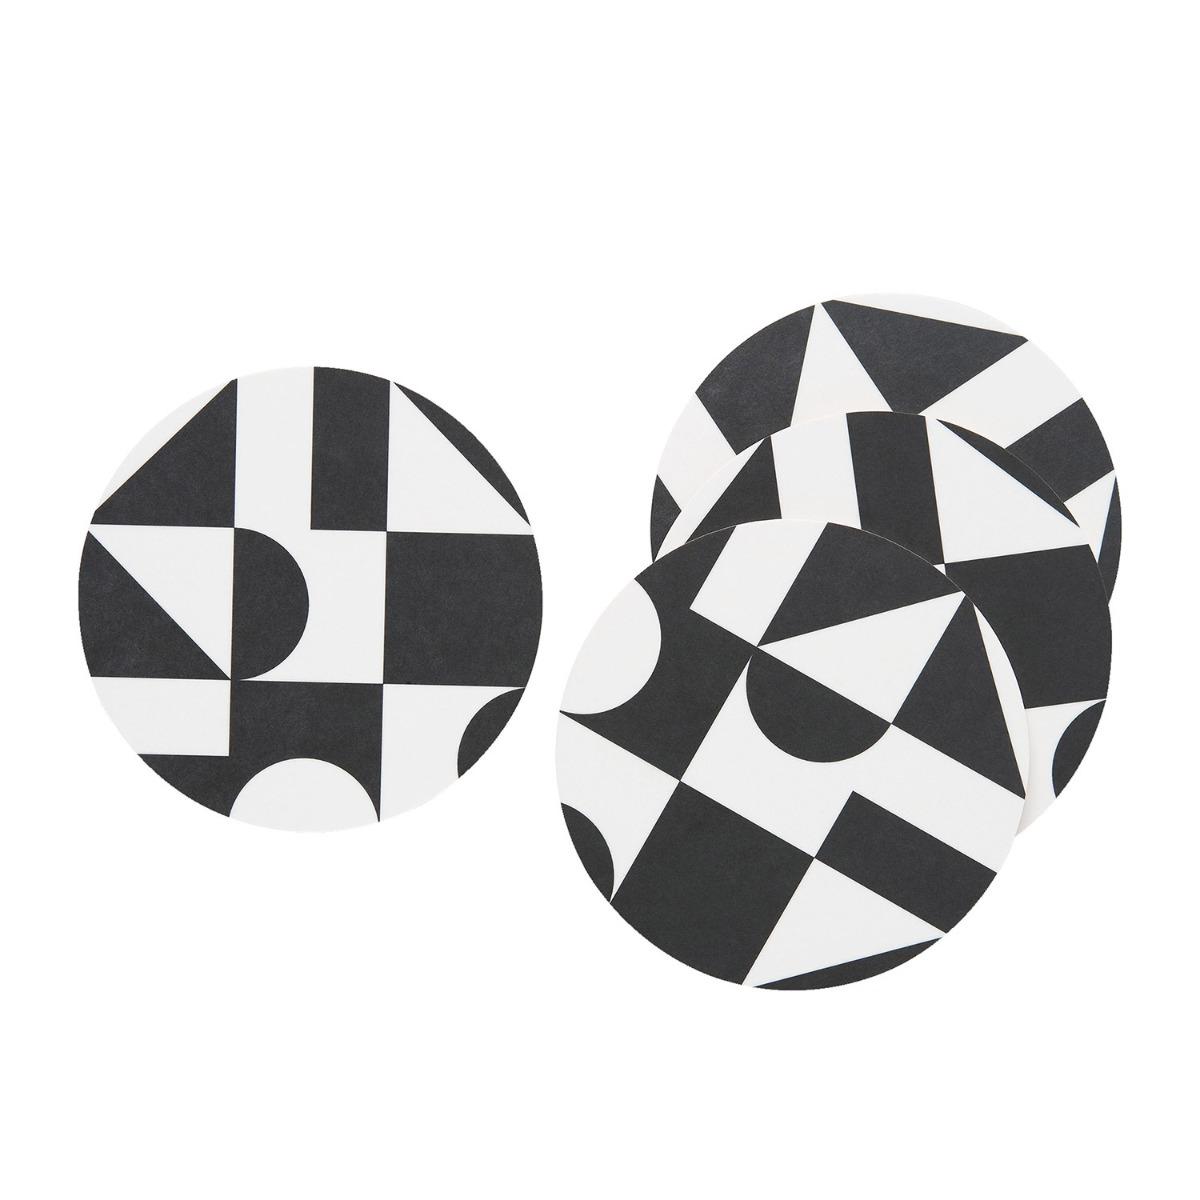 Designtorget Glasunderlägg DT 4-p Svart